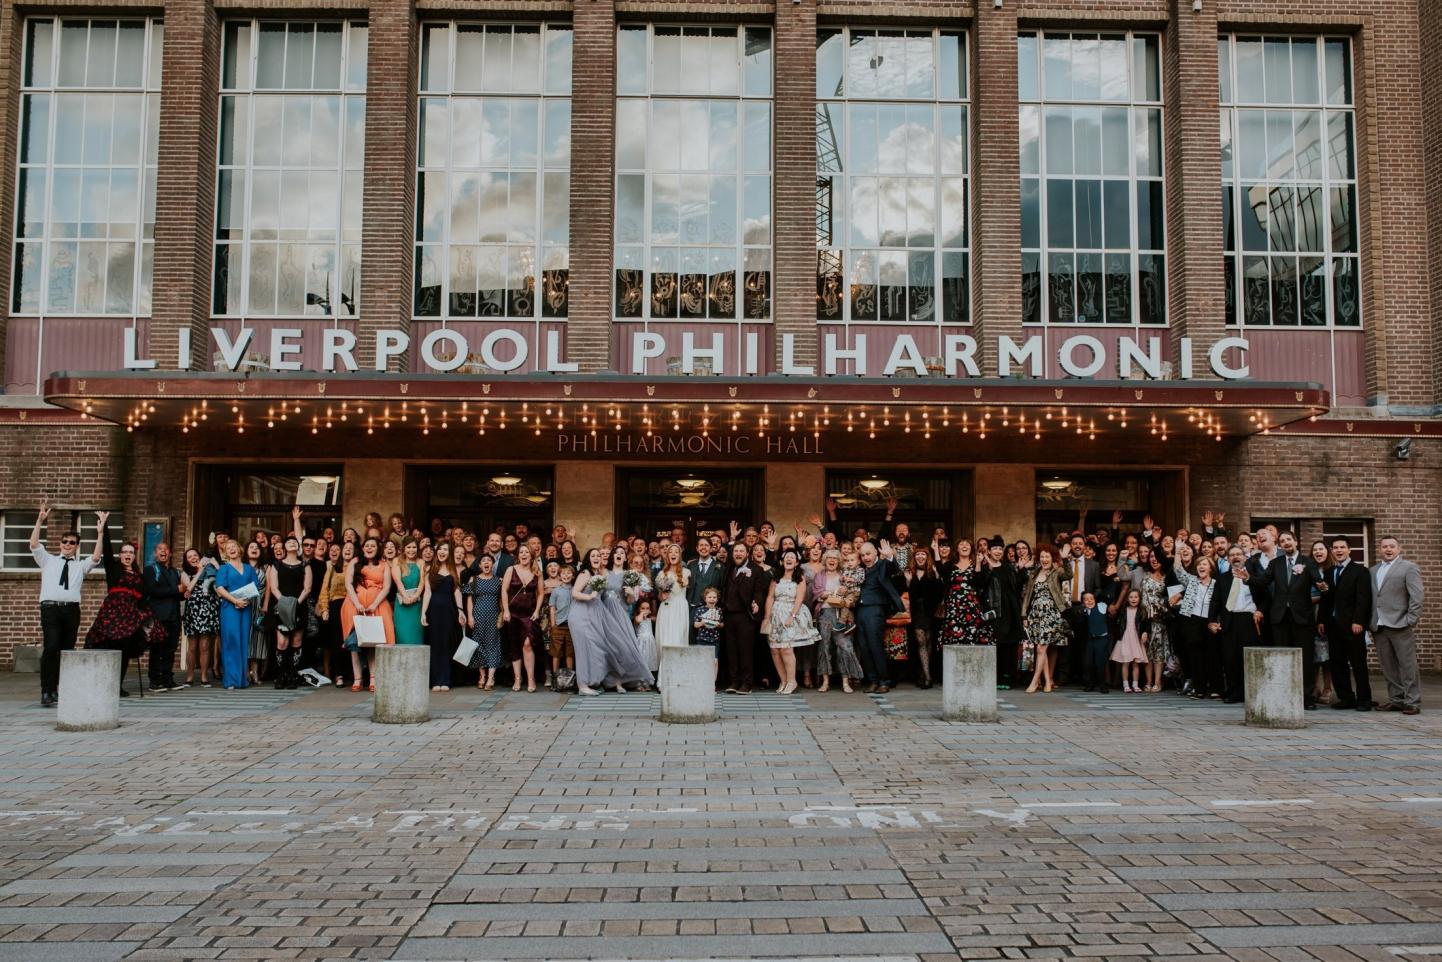 liverpool philharmonic hall wedding photography becky ryan photography